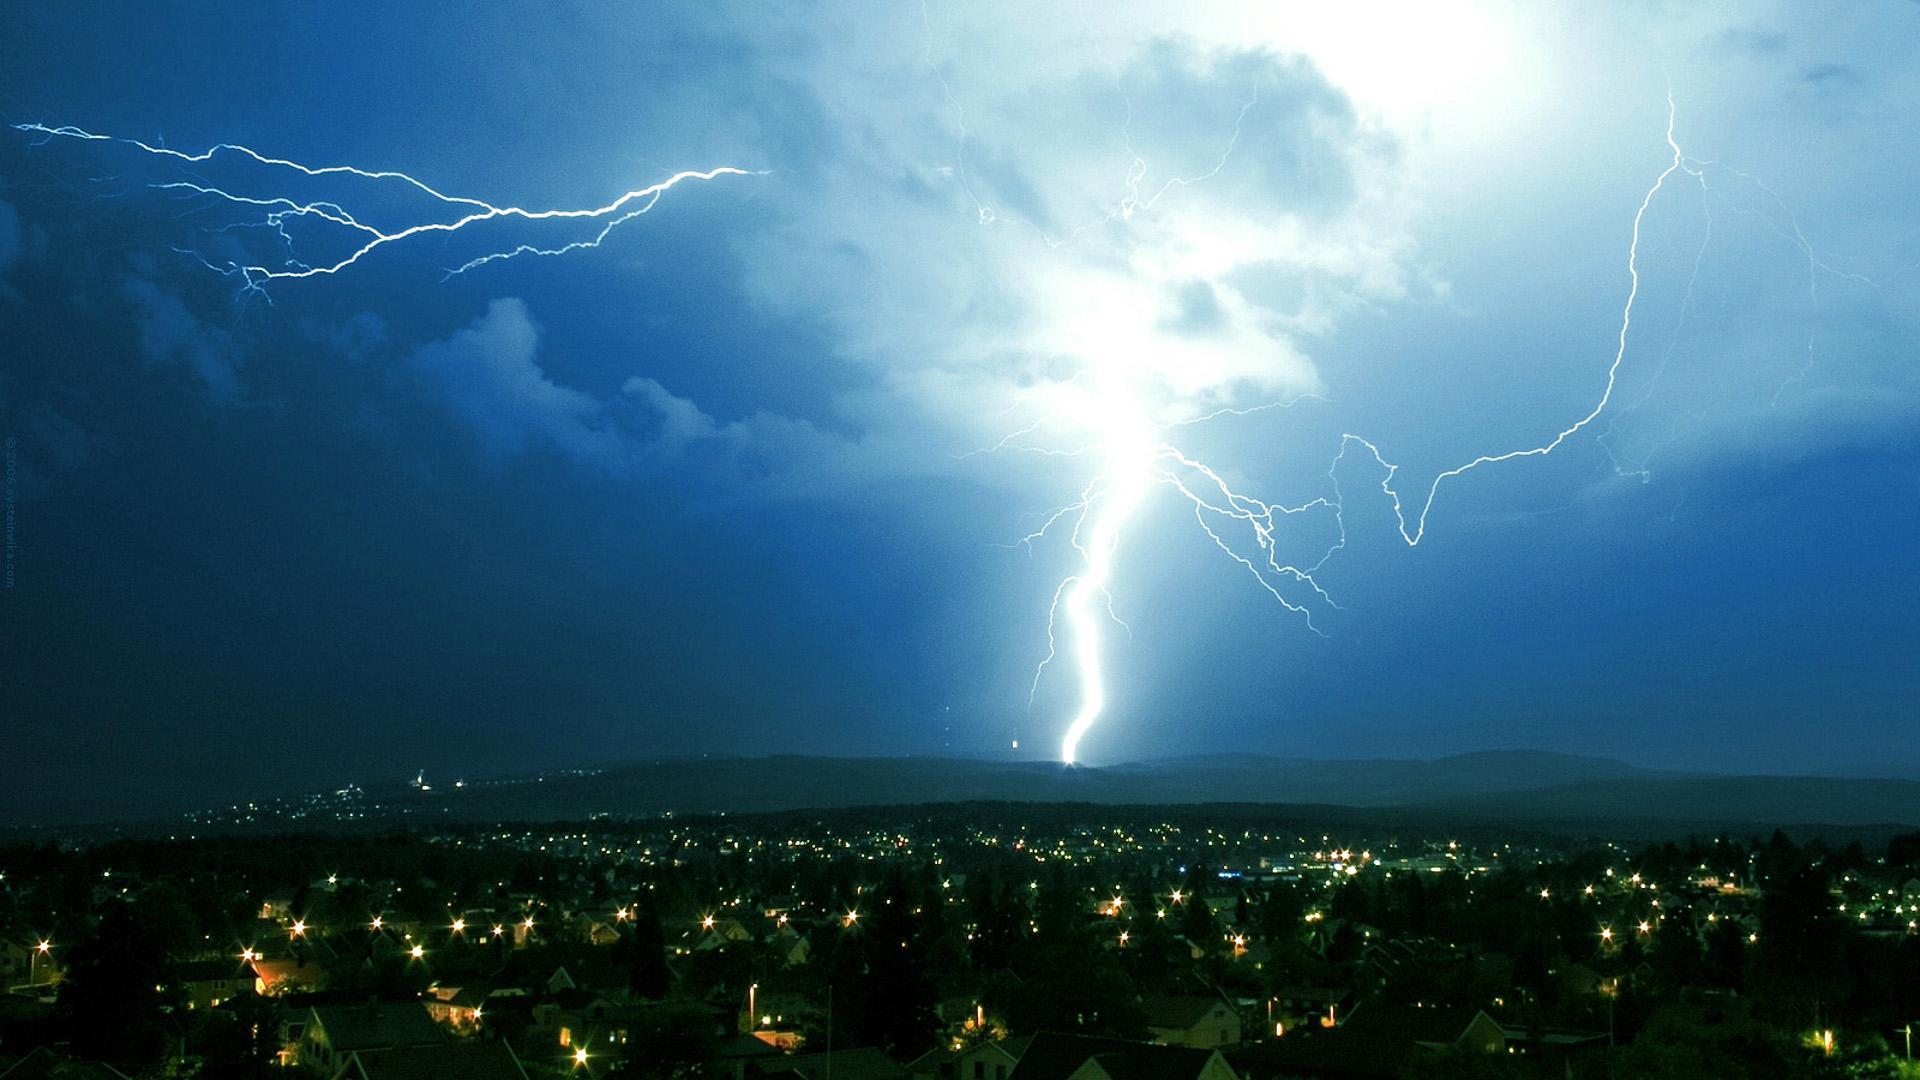 Flash clipart lightning strike On Quality Free Download Lightning